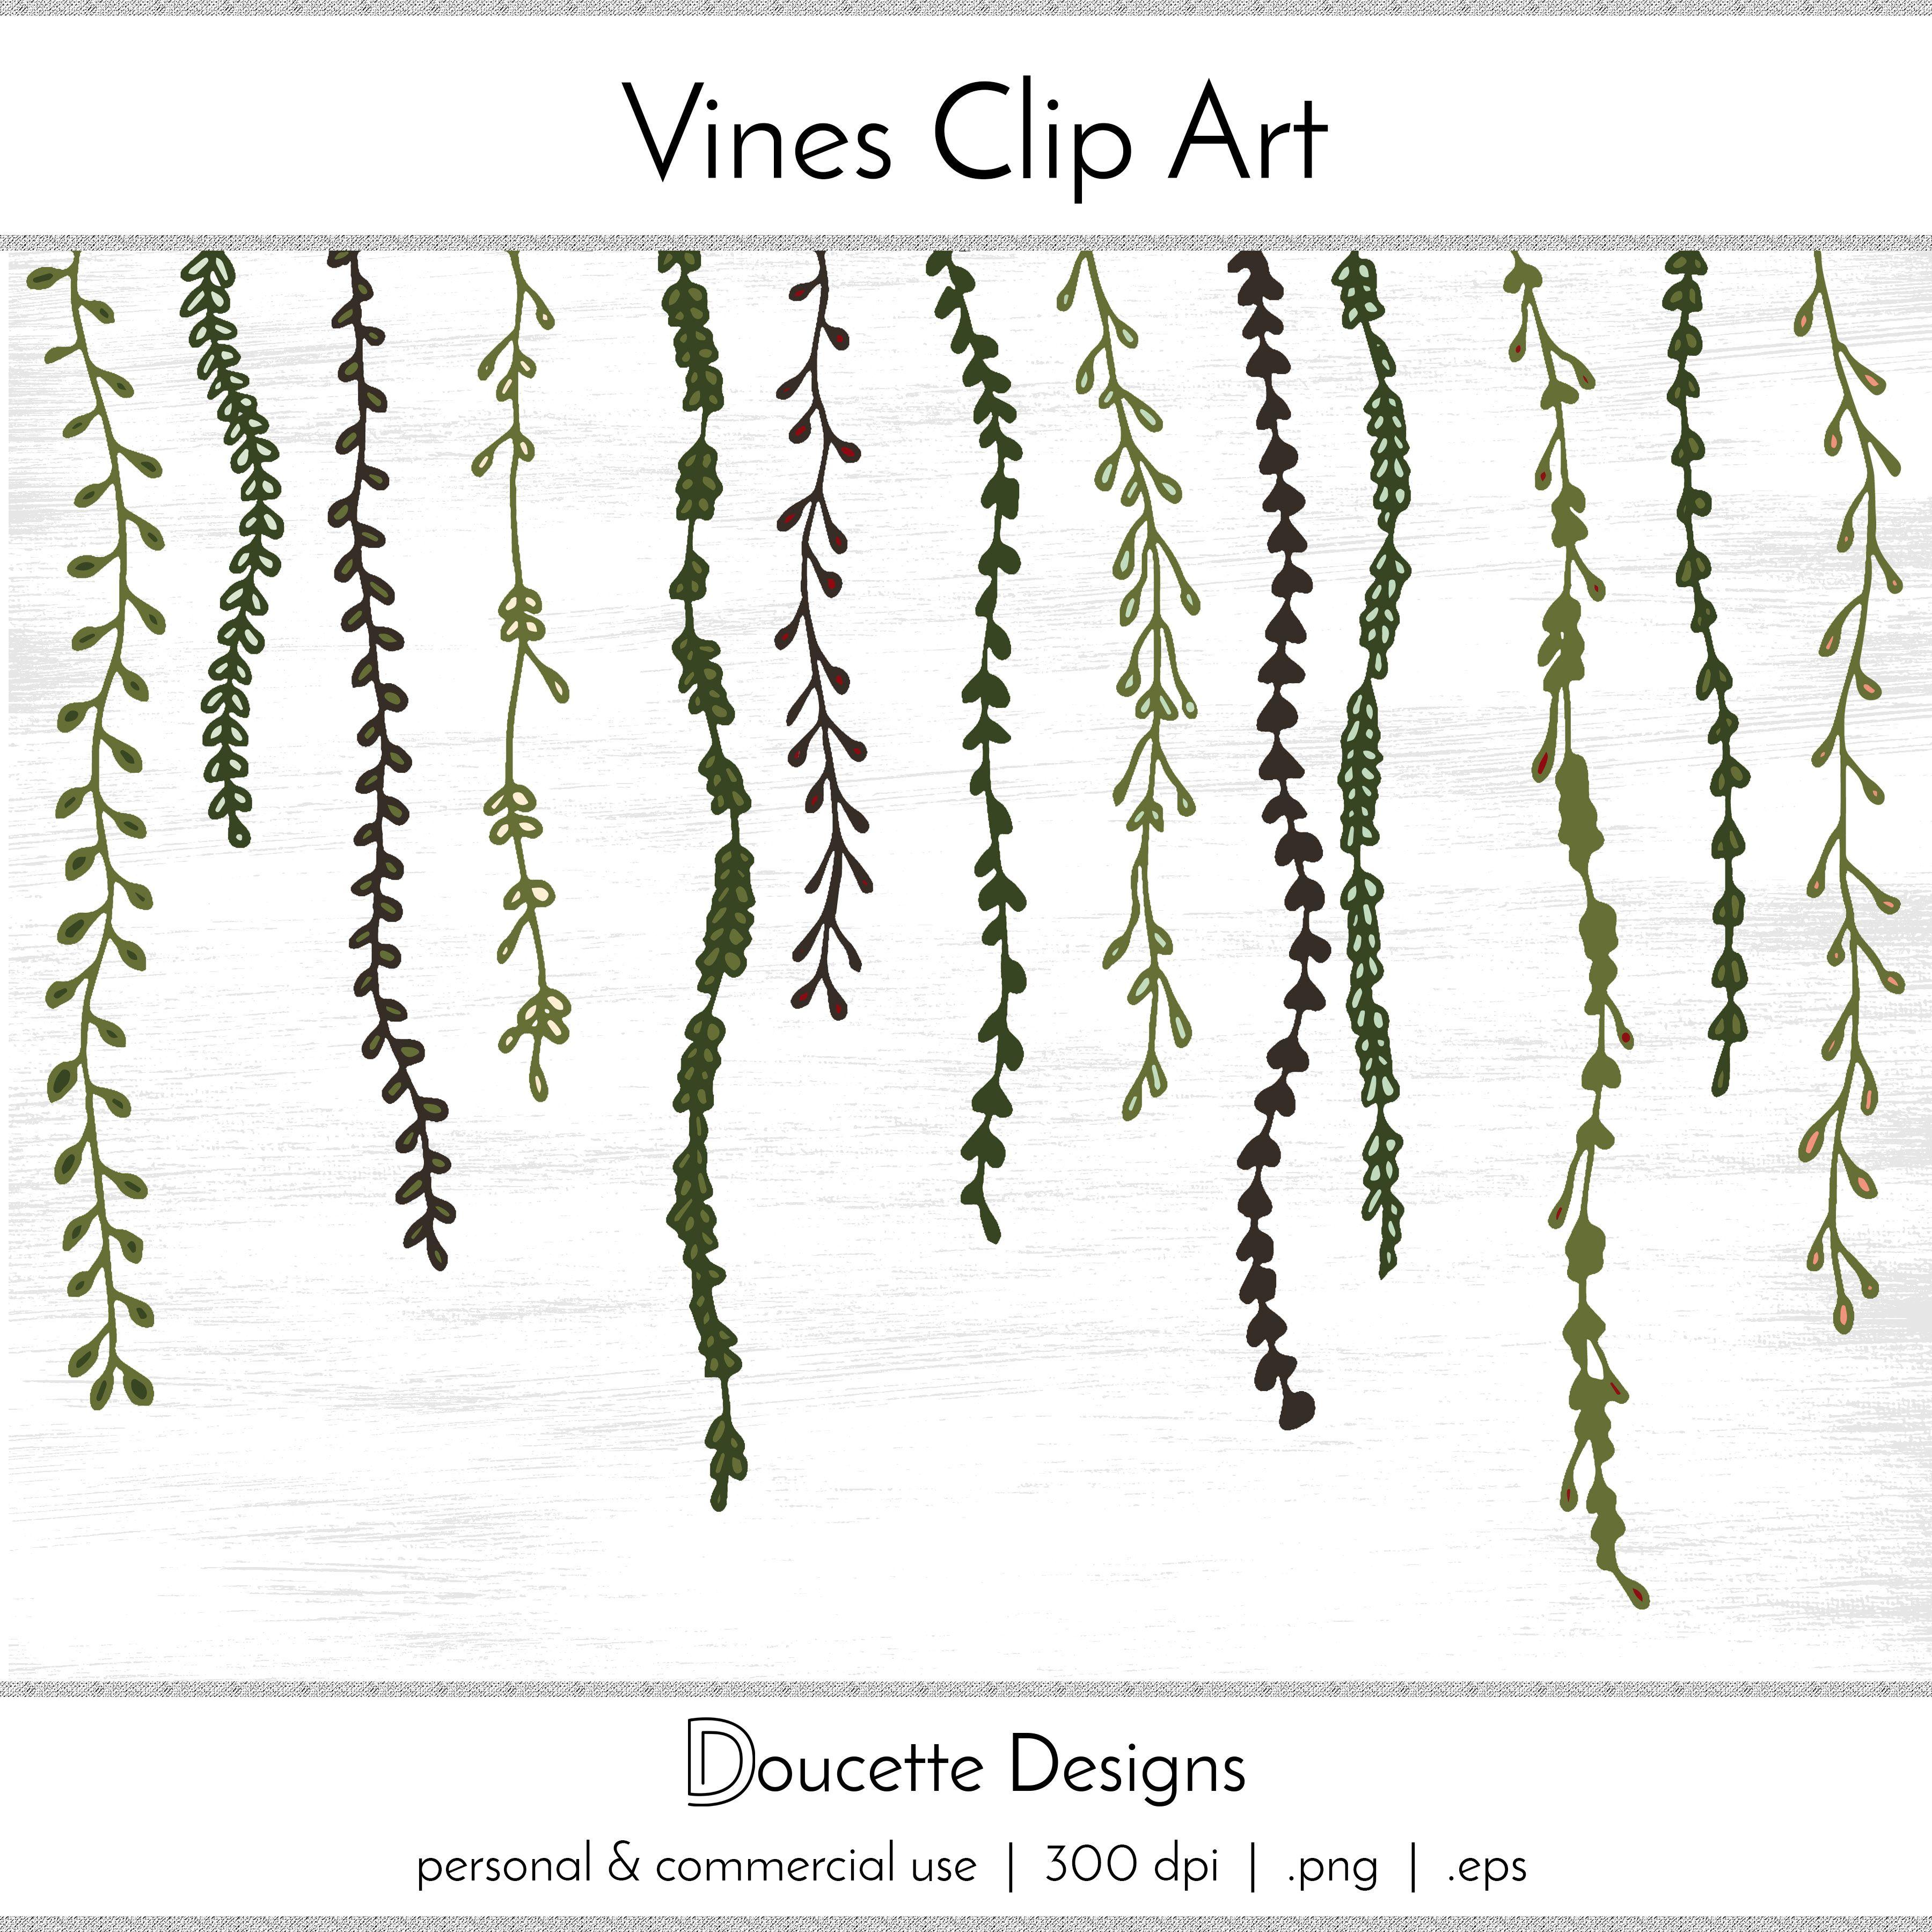 Vines clipart hand drawn. Handdrawn decoration illustration vector